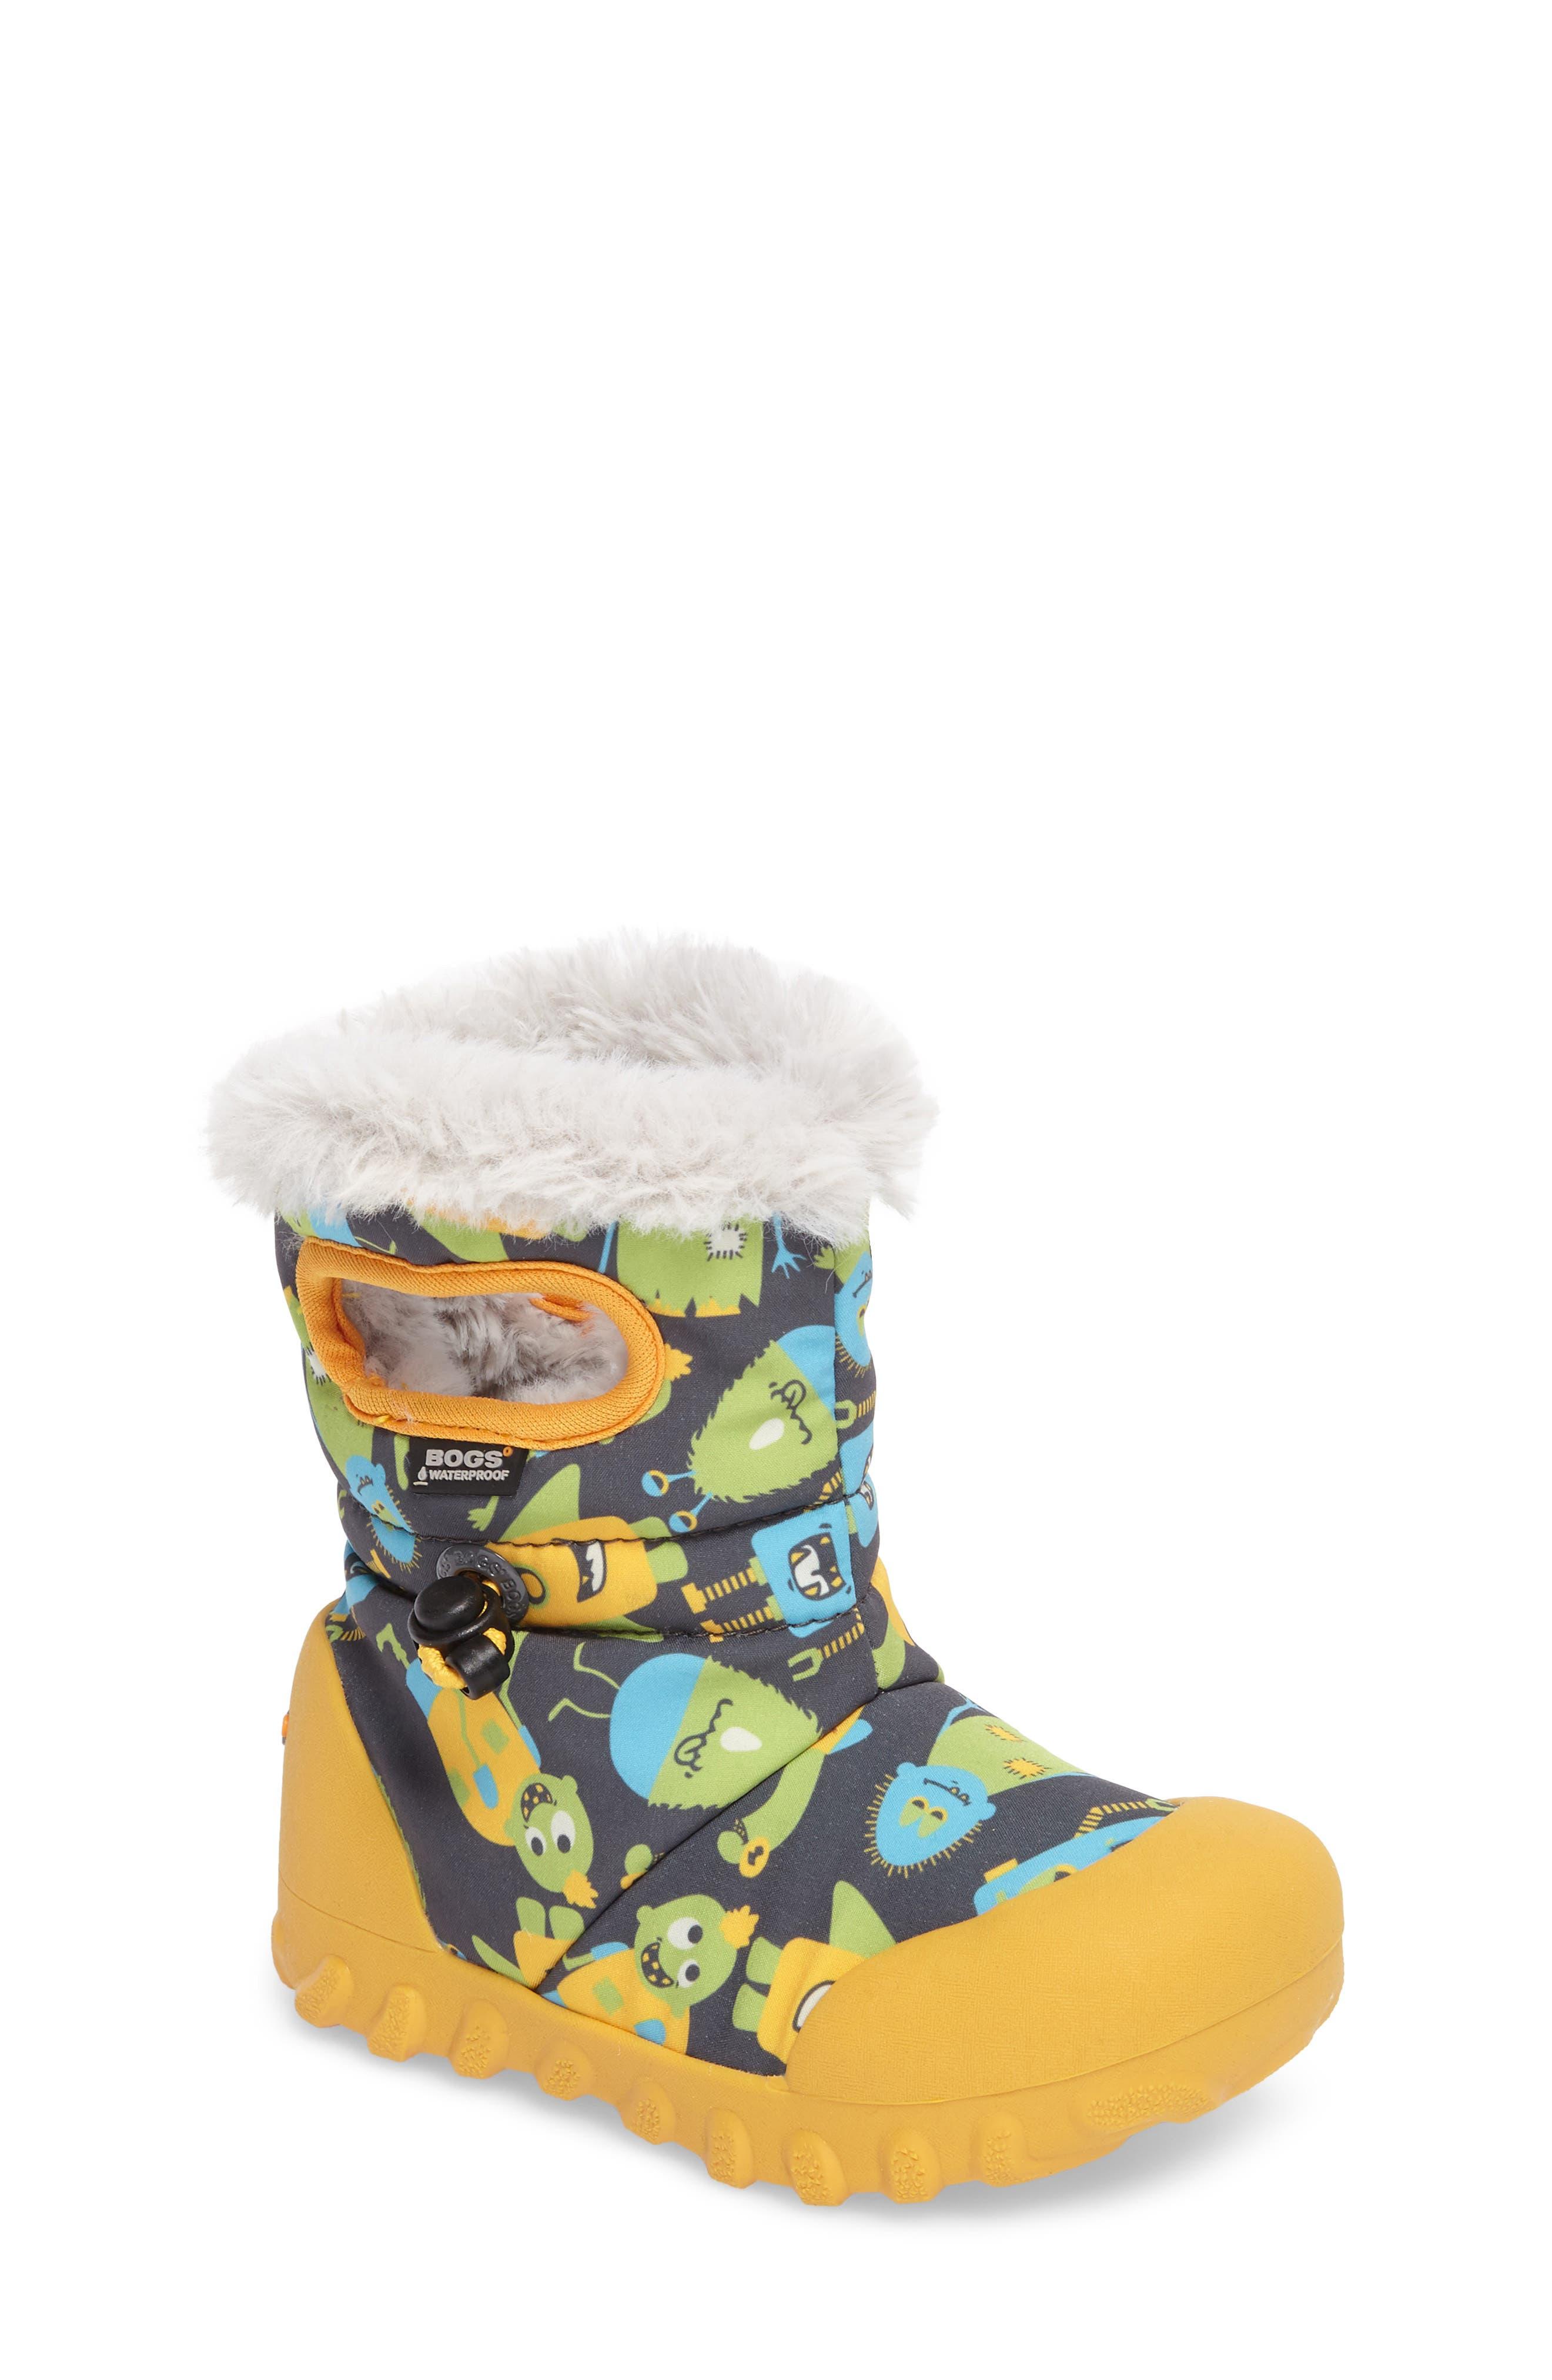 Alternate Image 1 Selected - Bogs B-MOC Monsters Waterproof Insulated Faux Fur Winter Boot (Walker, Toddler, Little Kid & Big Kid)